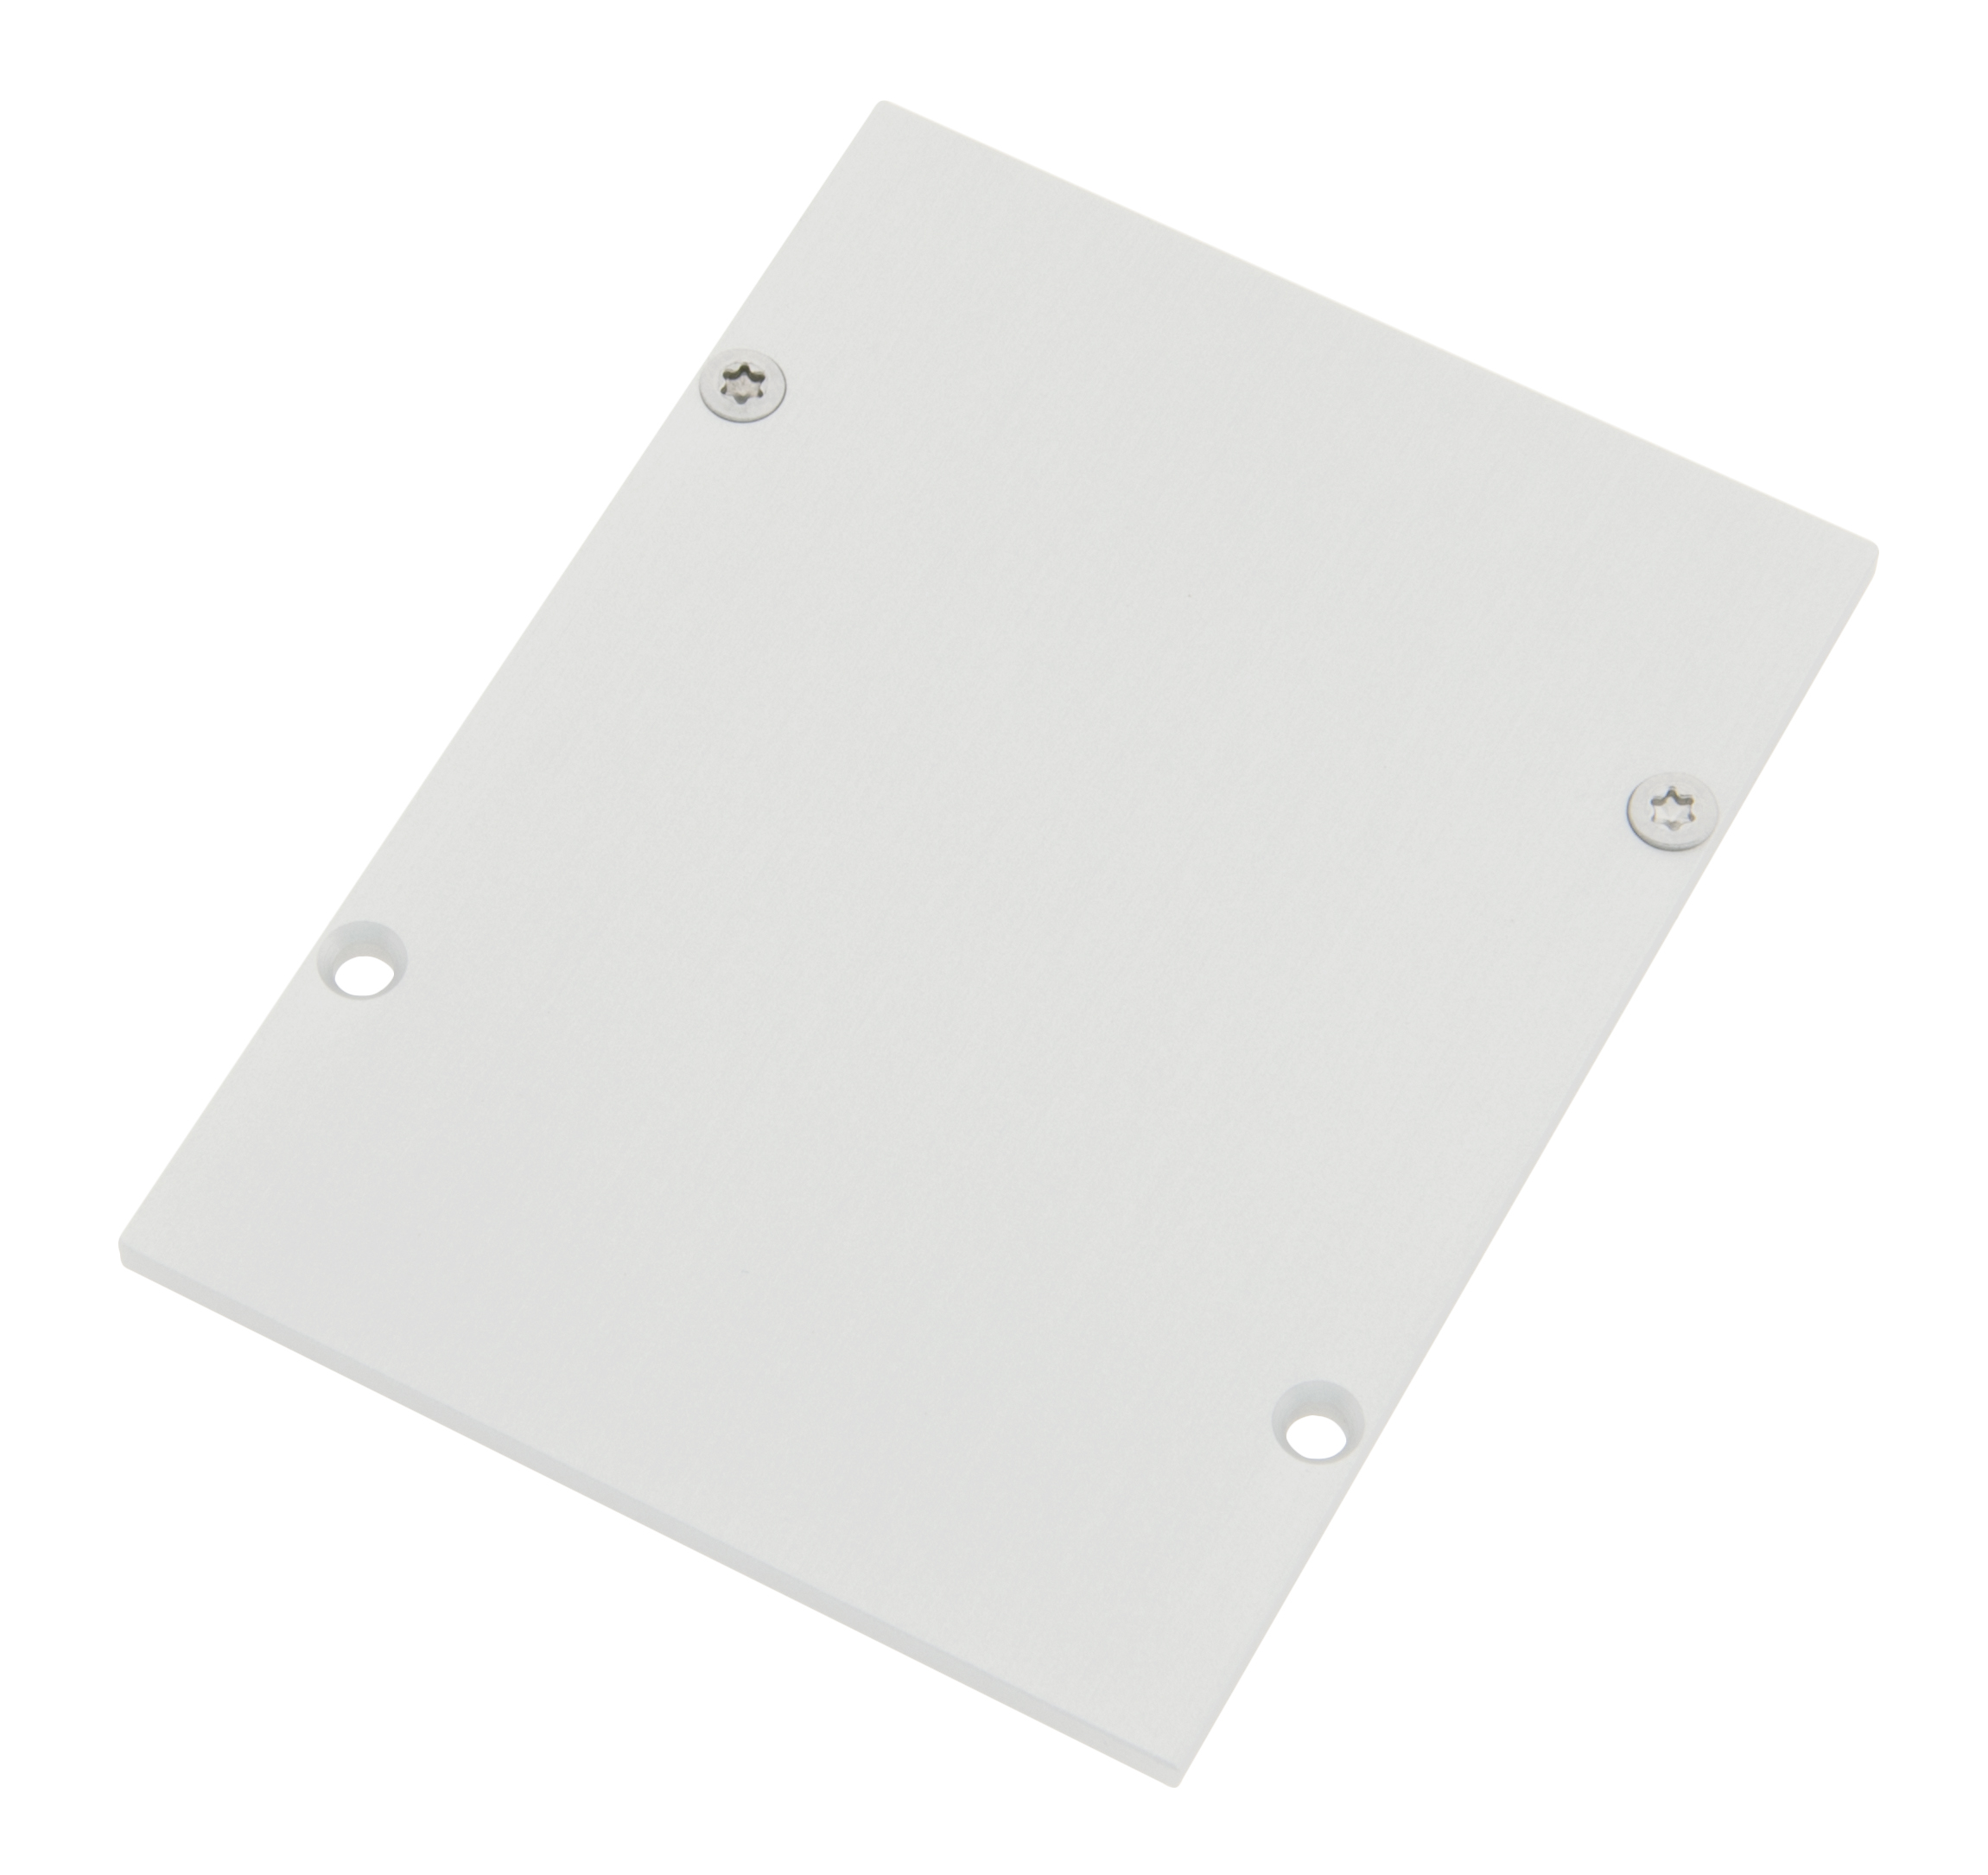 1 Stk Profil Endkappe SLH inkl. Schrauben LIEK003400